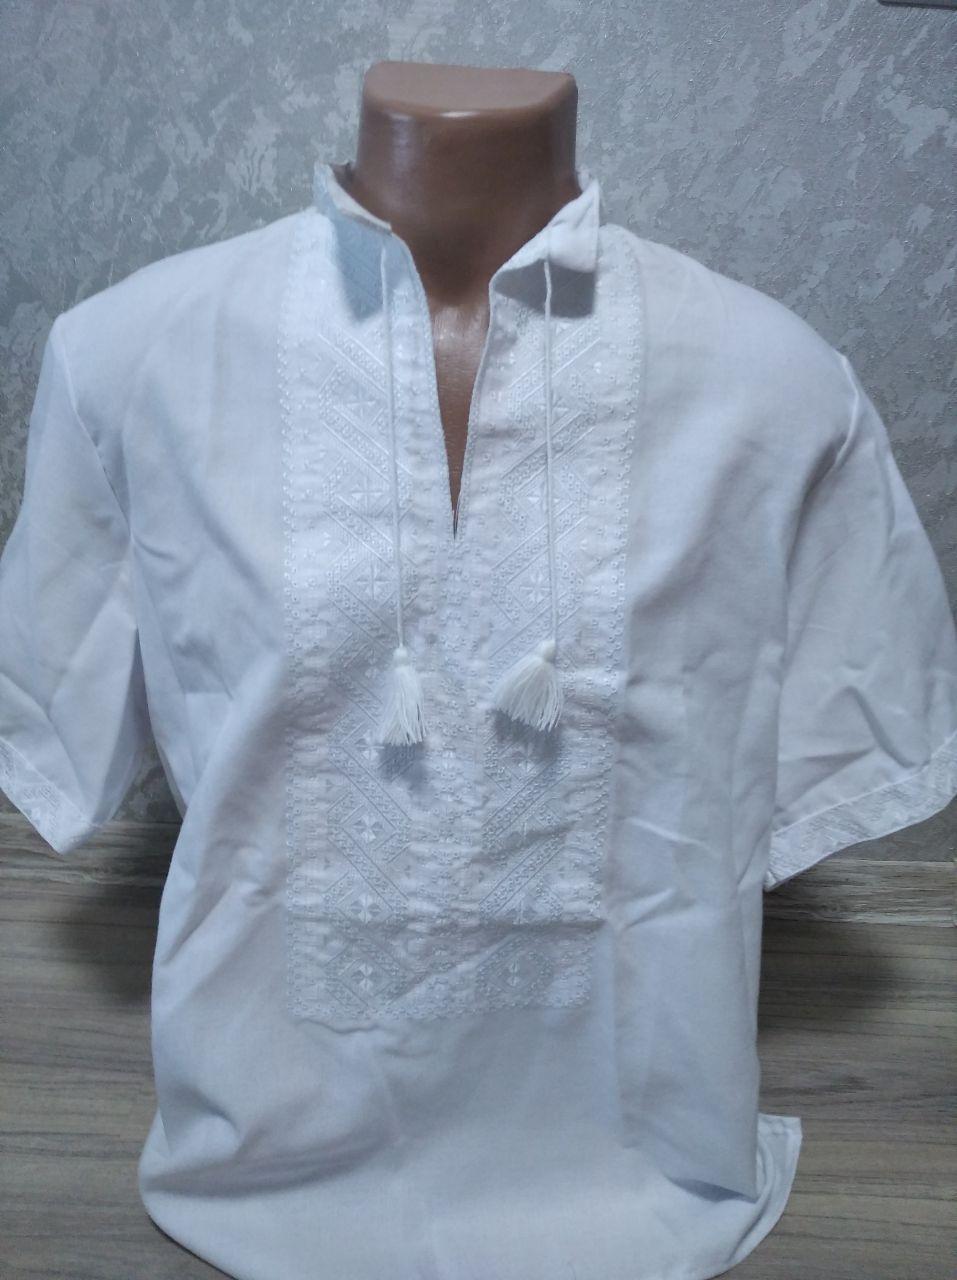 Мужская вышиванка белая с коротким рукавом - размер XL